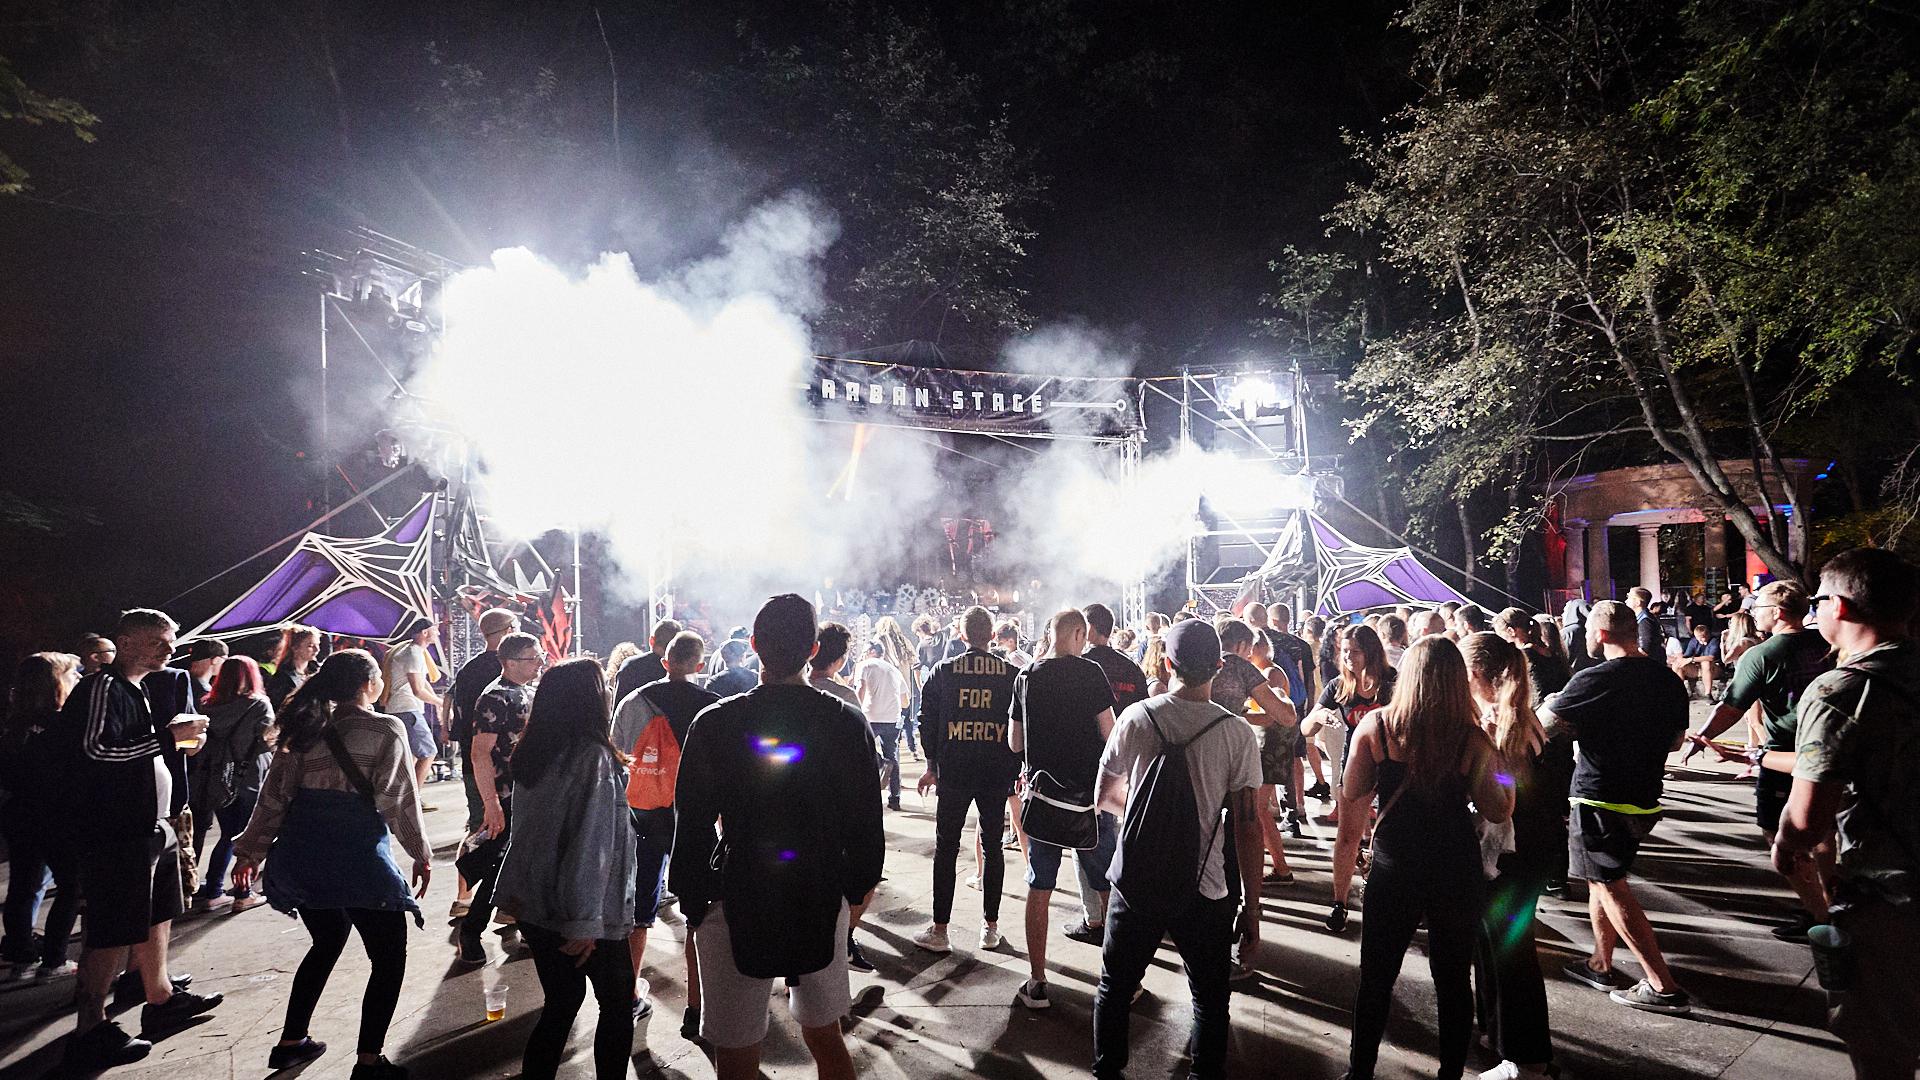 FEST Festival / Fot. Piotr Szewc / 175 BPM